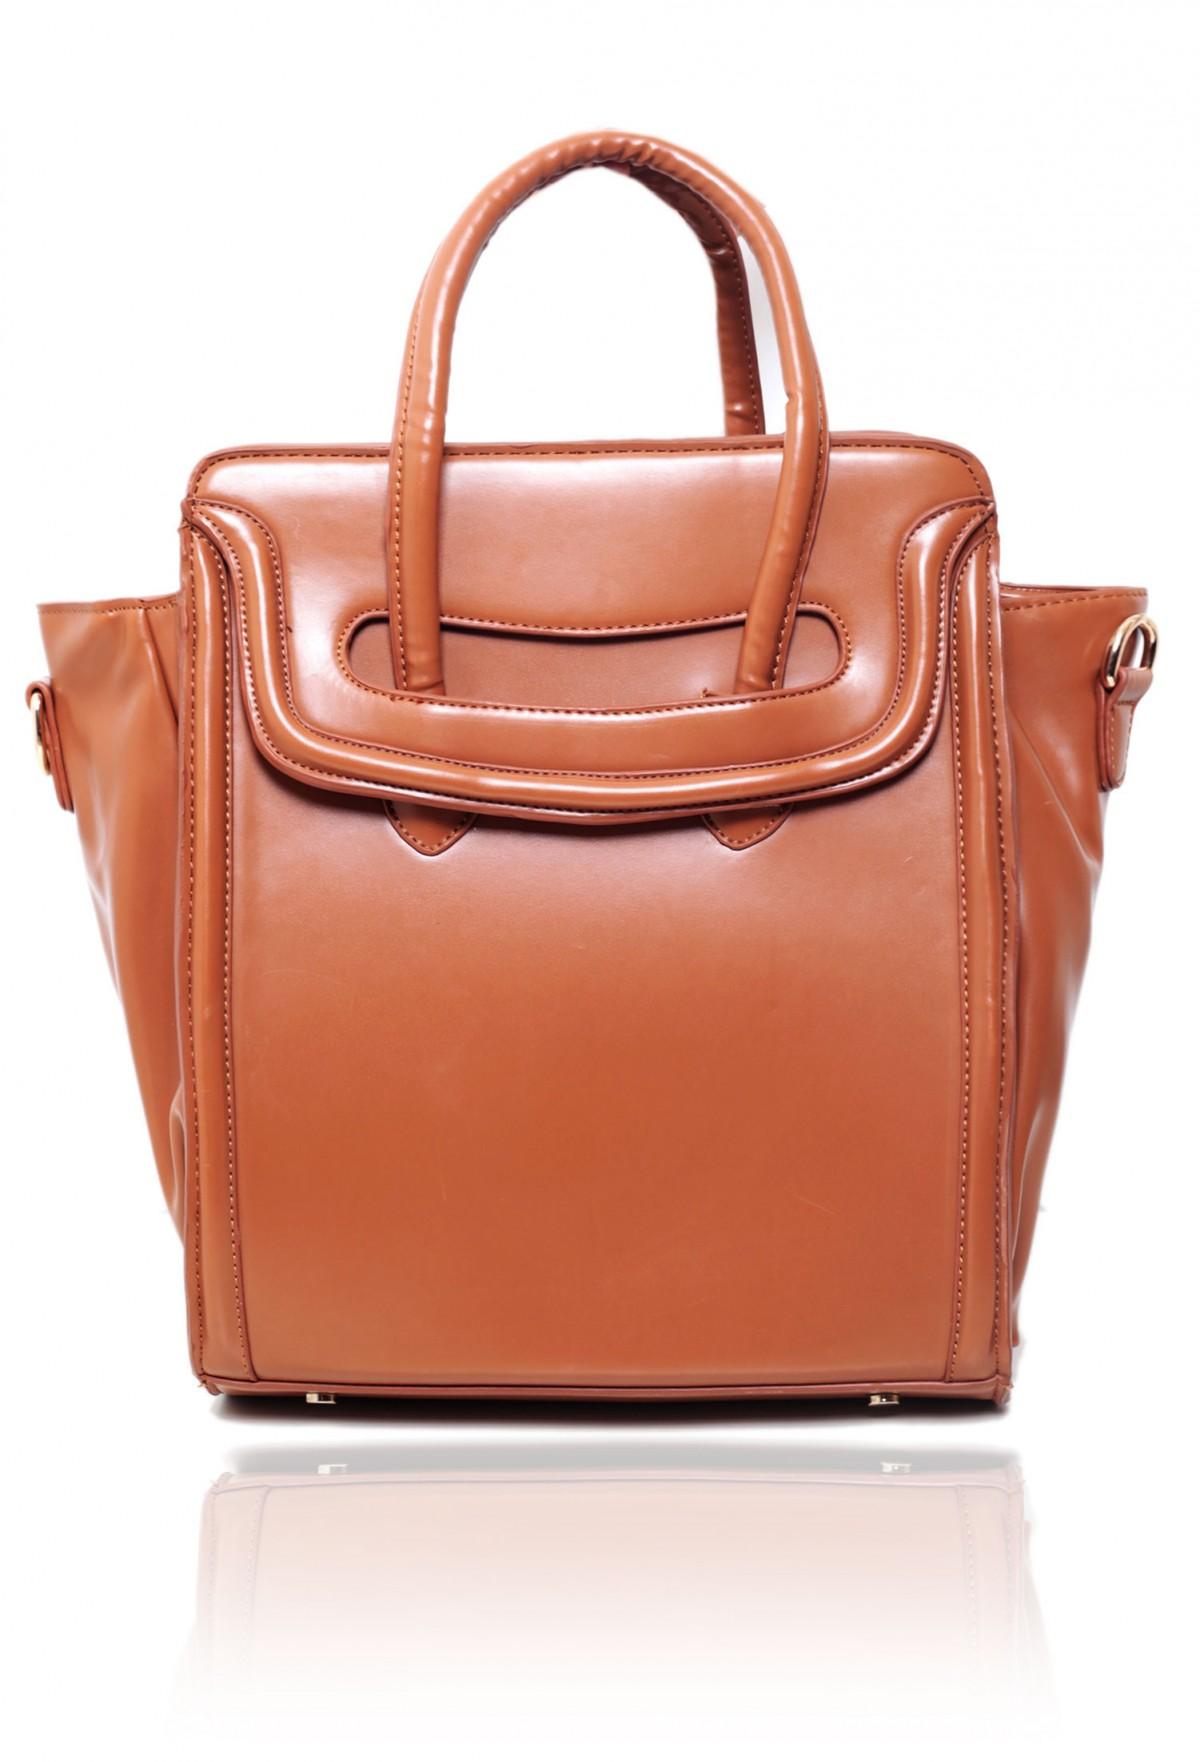 Grovsvenor Tan Cut-Out Detail Handbag | Pink Boutique